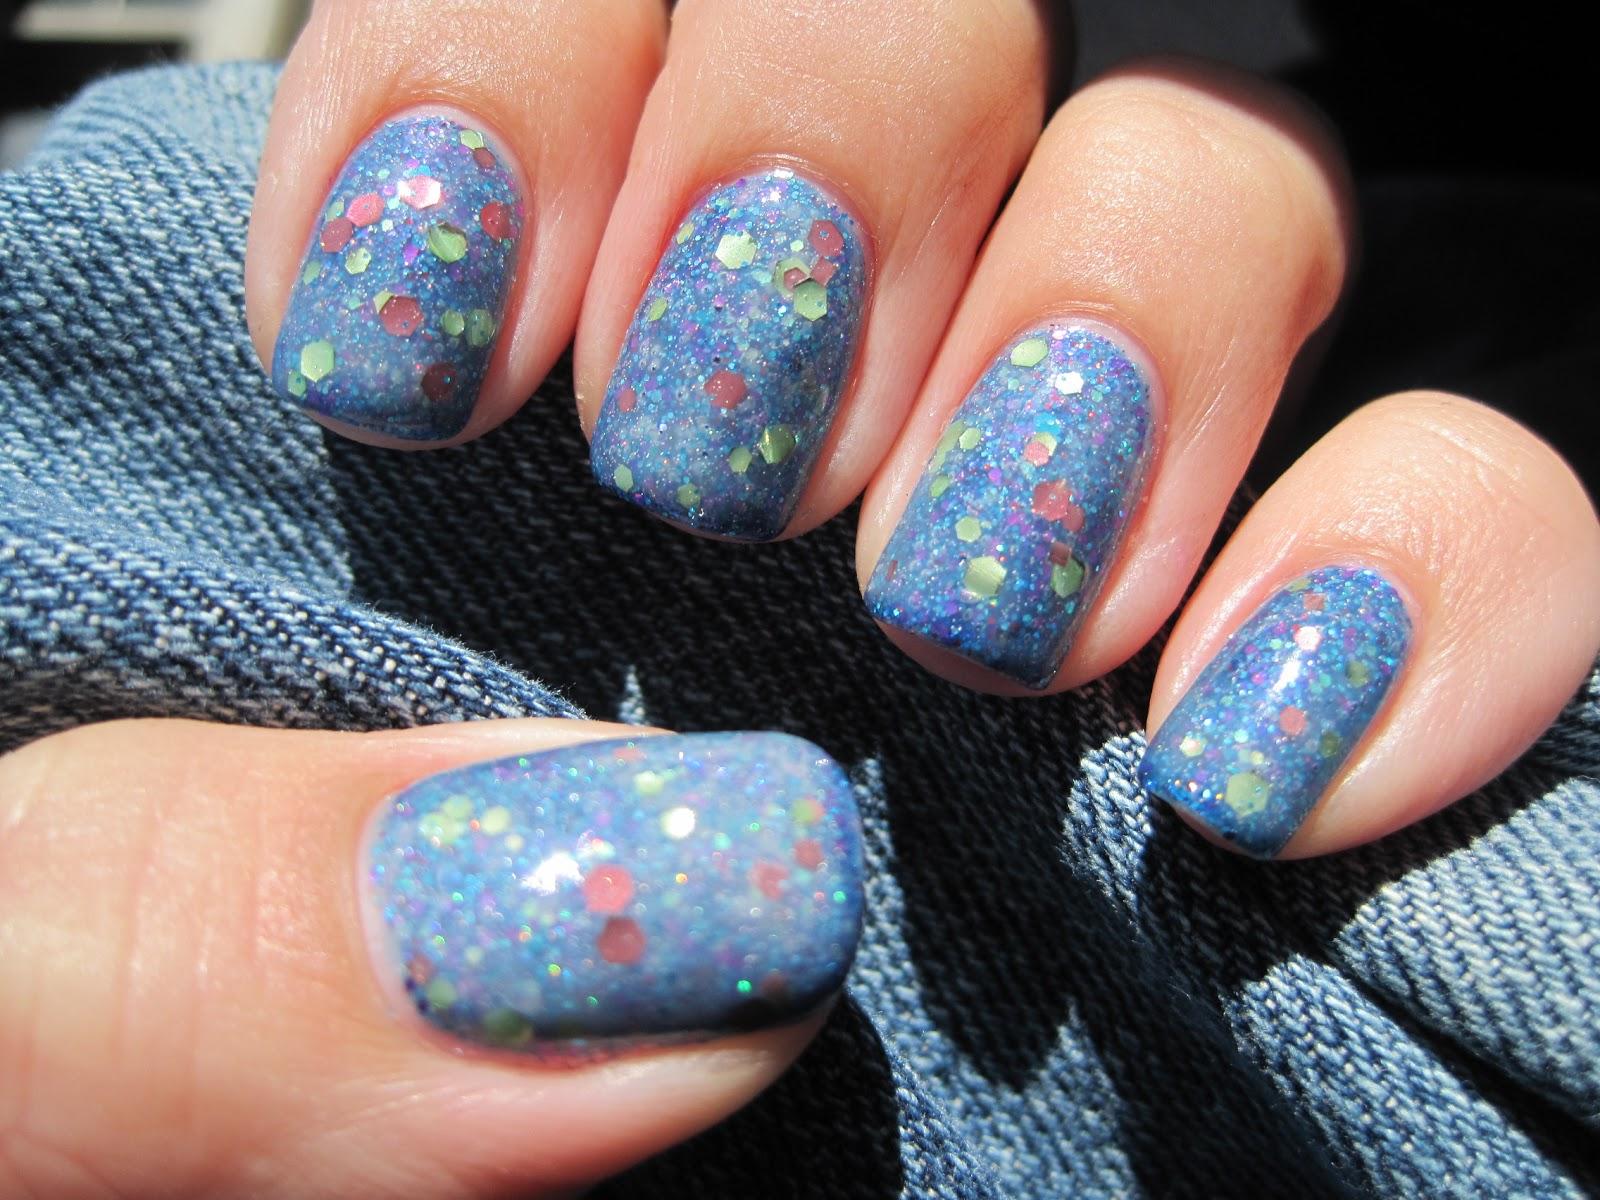 Sparkly Vernis: Emily de Molly Milky Way over Pahlish Train ...